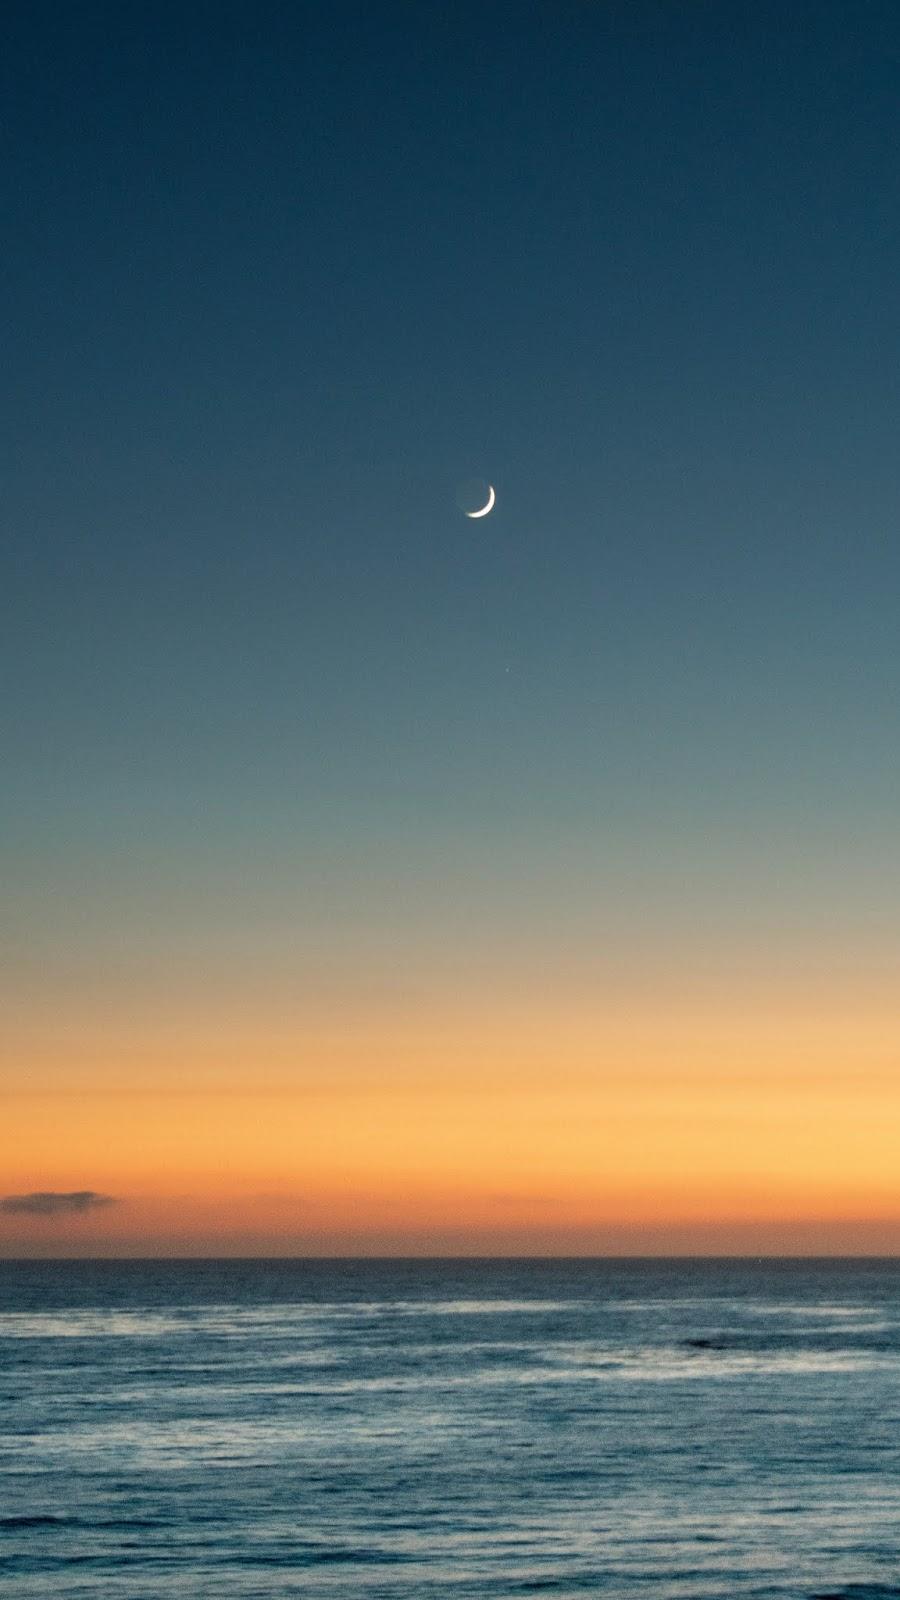 Sky before nighttime